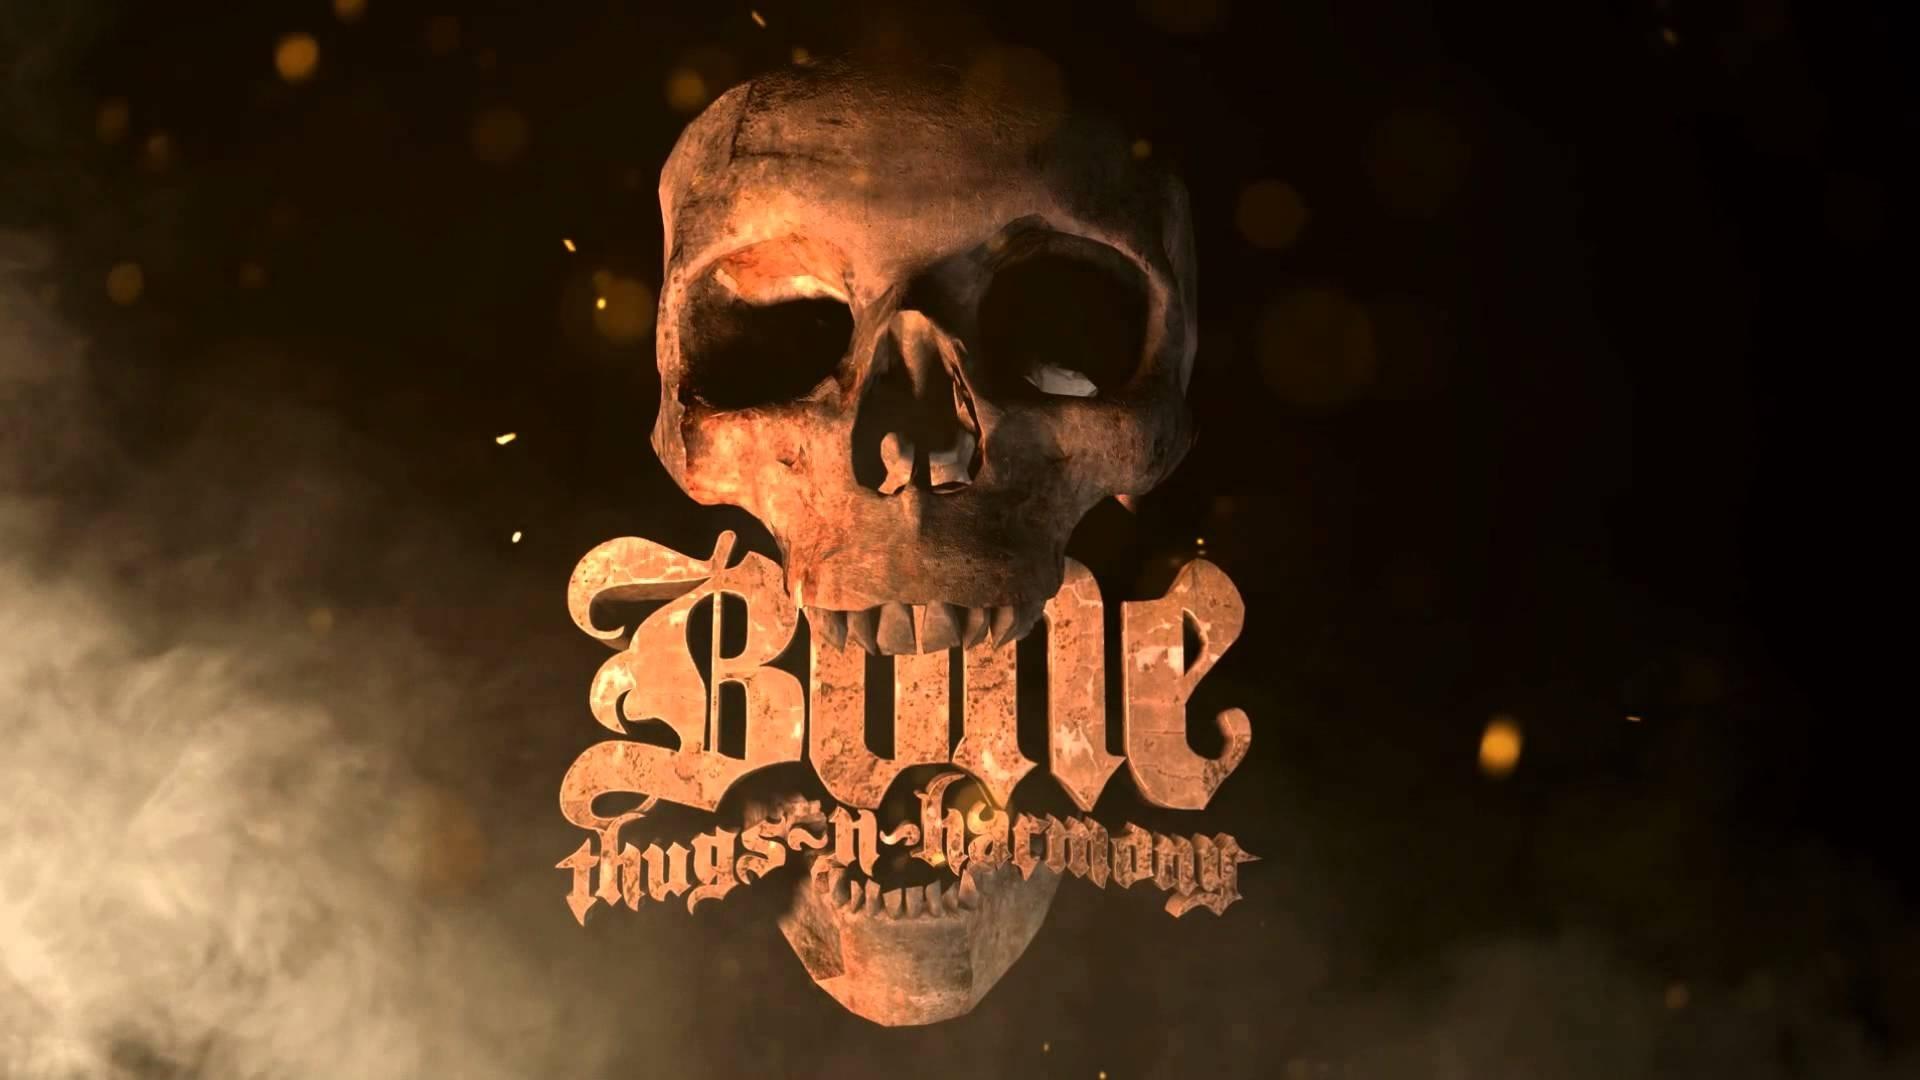 bone thugs-n-harmony wallpapers - wallpaper cave